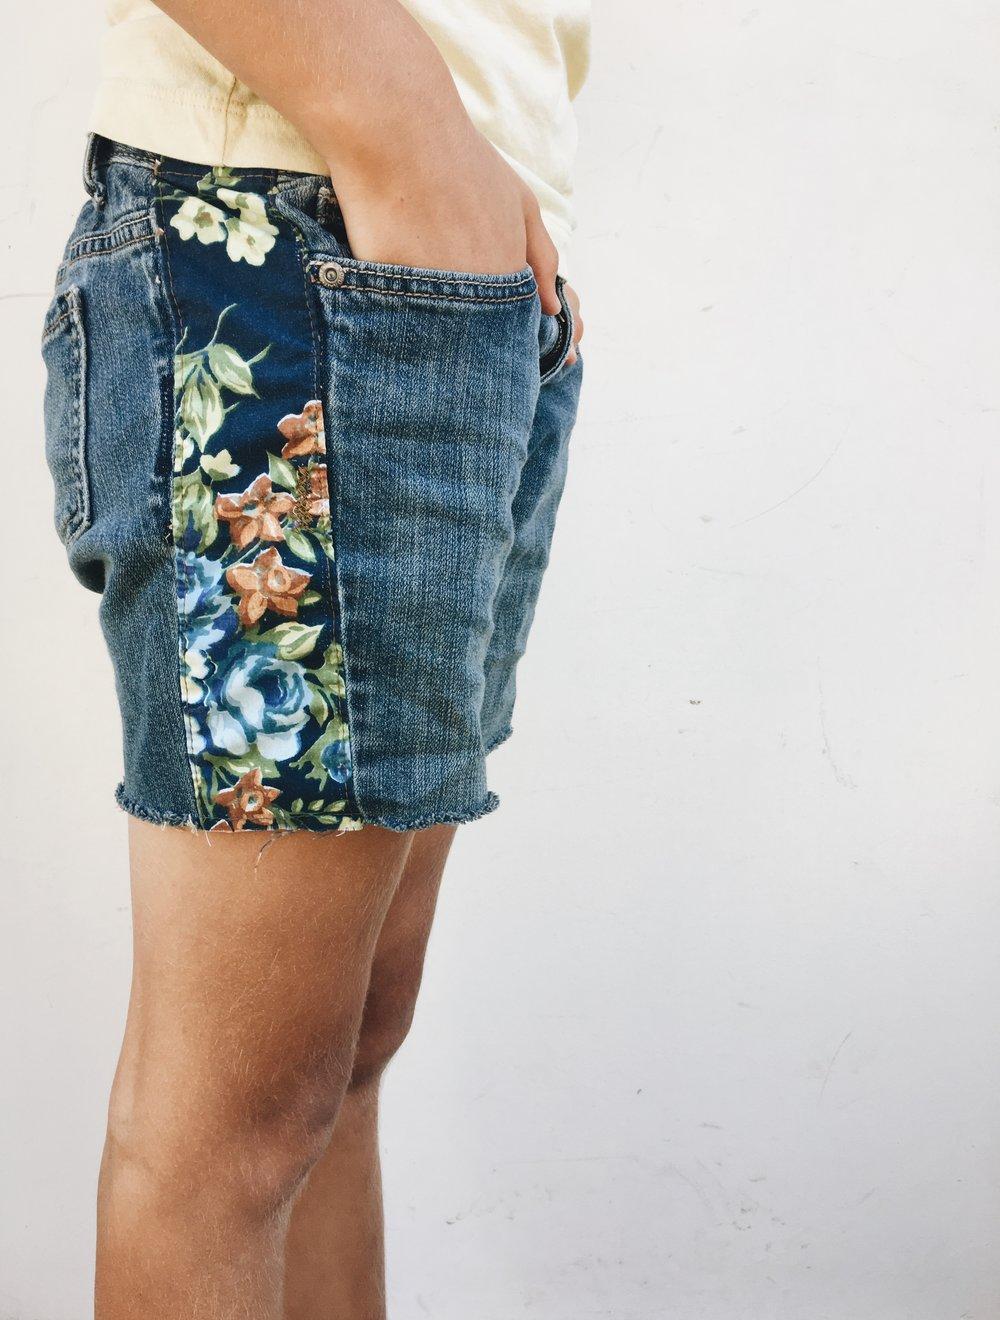 Jean Cuttoff Shorts Boho Style DIY via Bluecorduroy.com